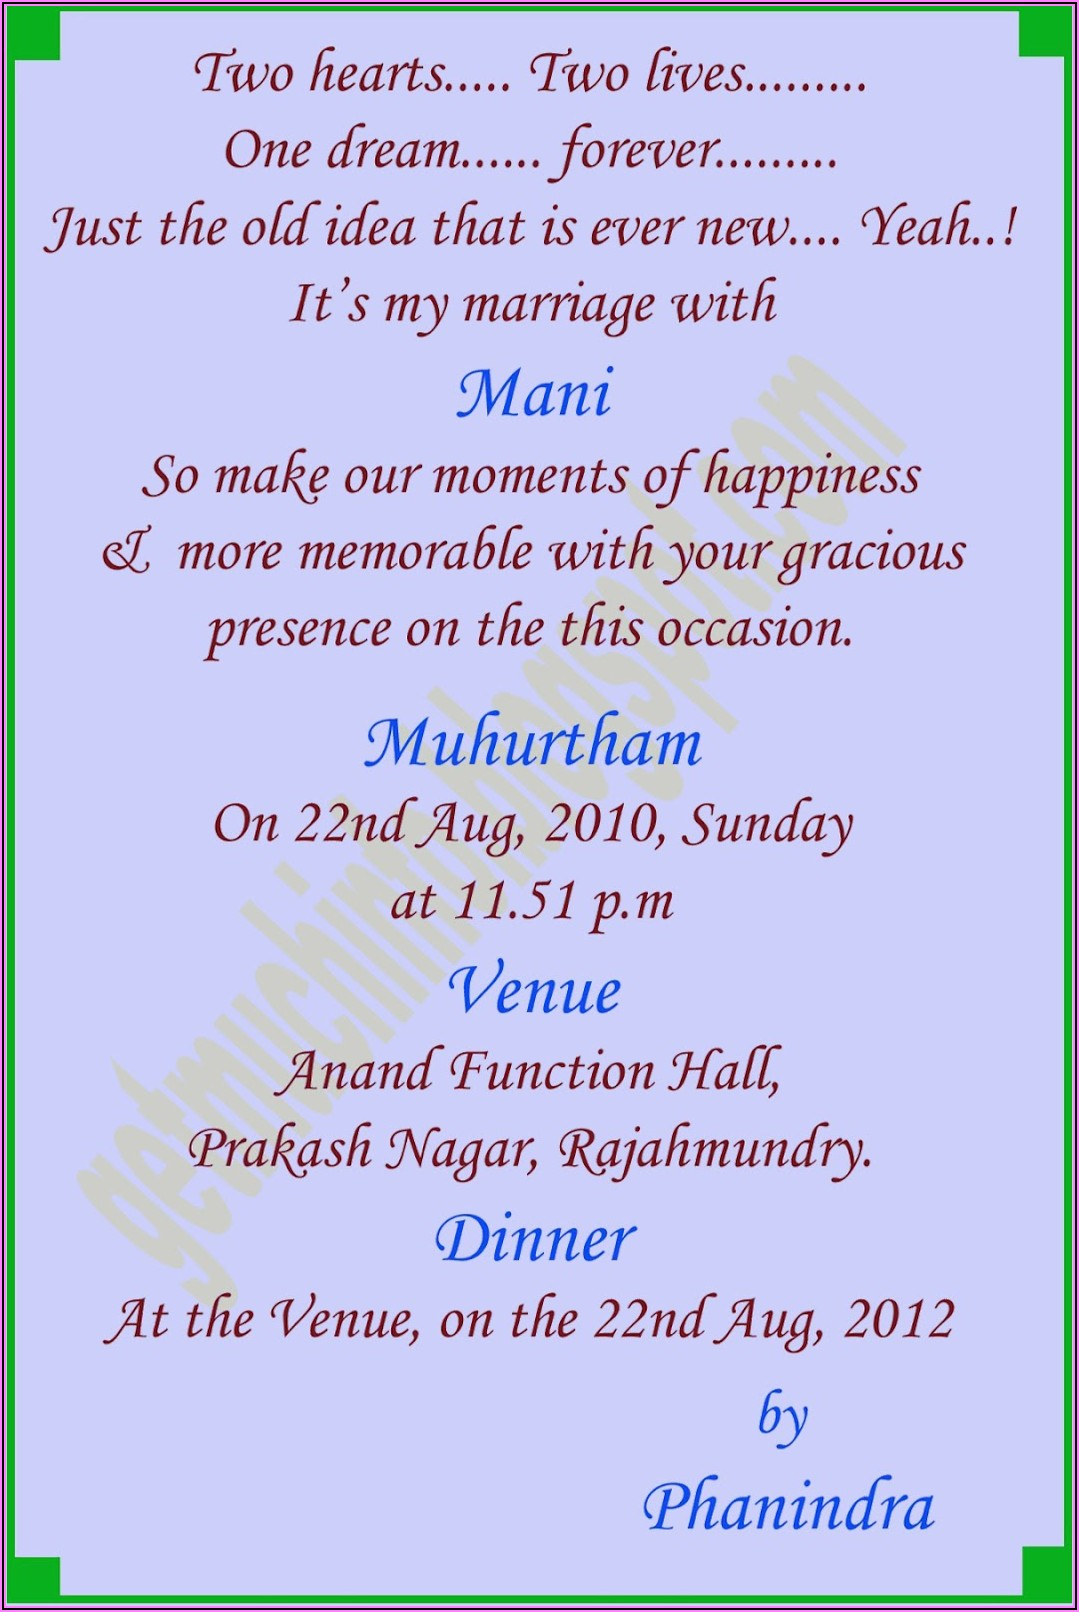 Arranged Marriage Wedding Invitation Wording For Friends